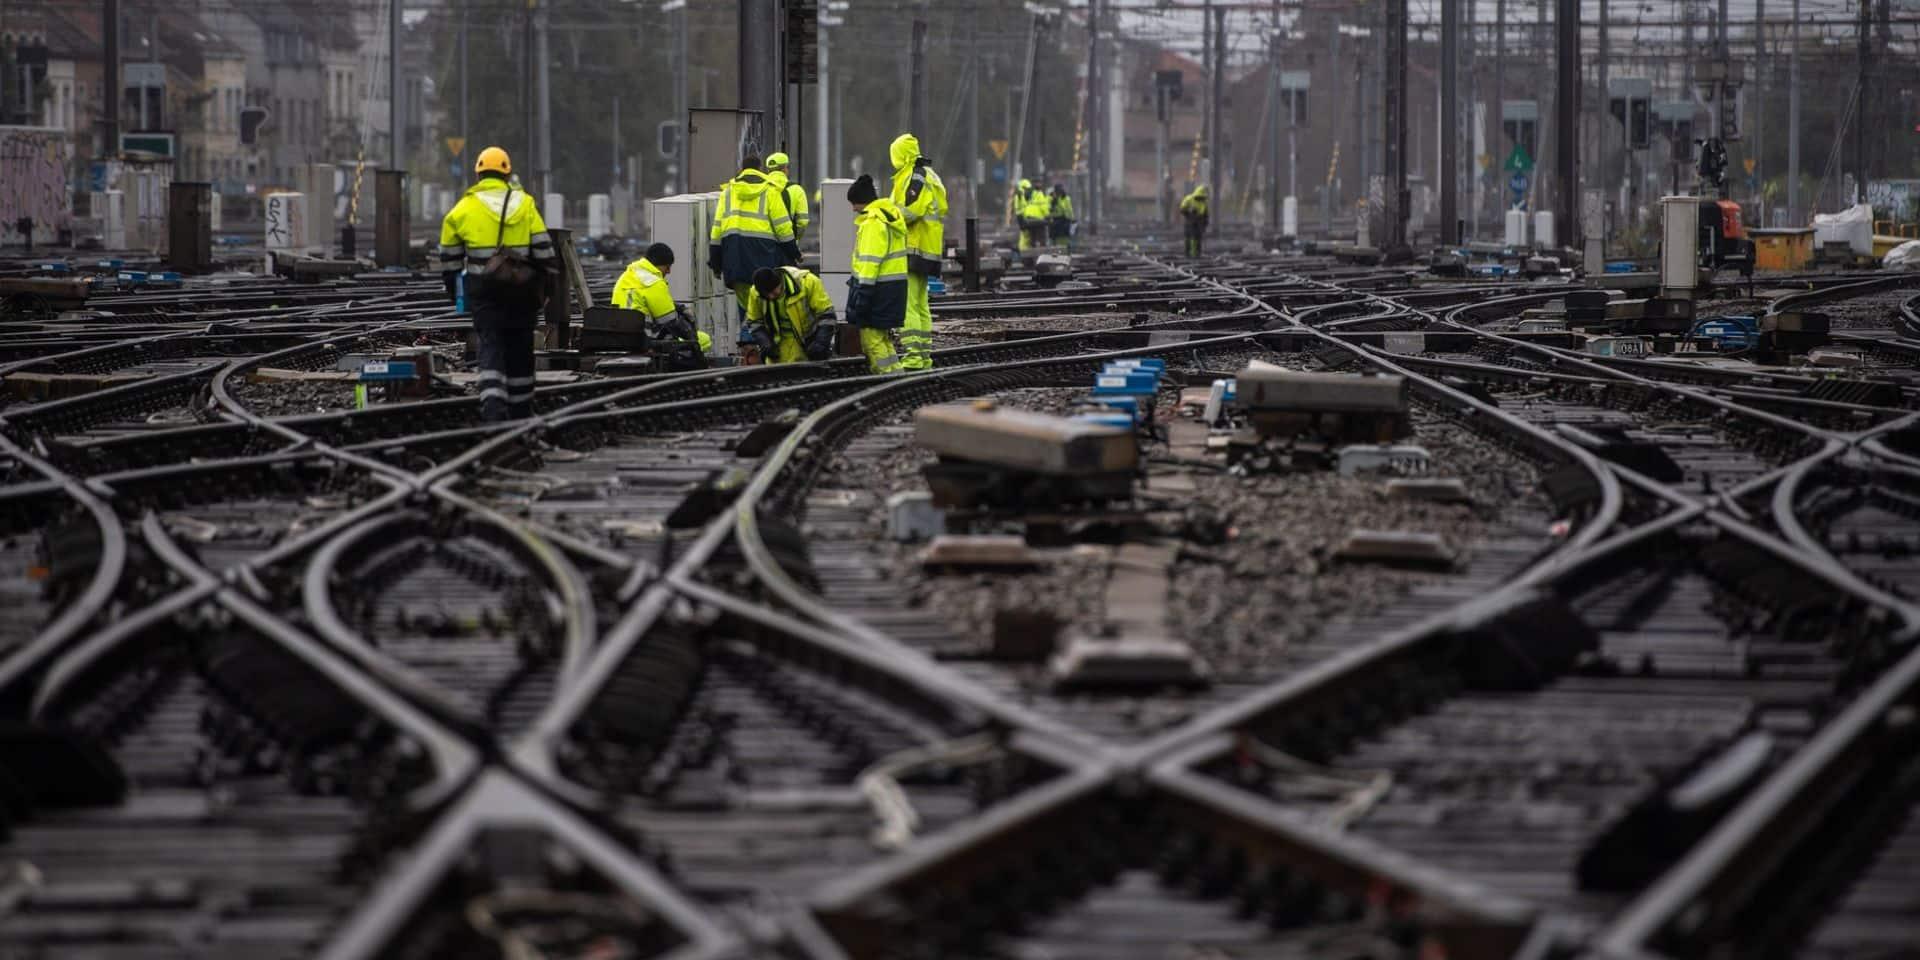 jonction Nord-Midi, SNCB, Infrabel, travaux, ferroviaire